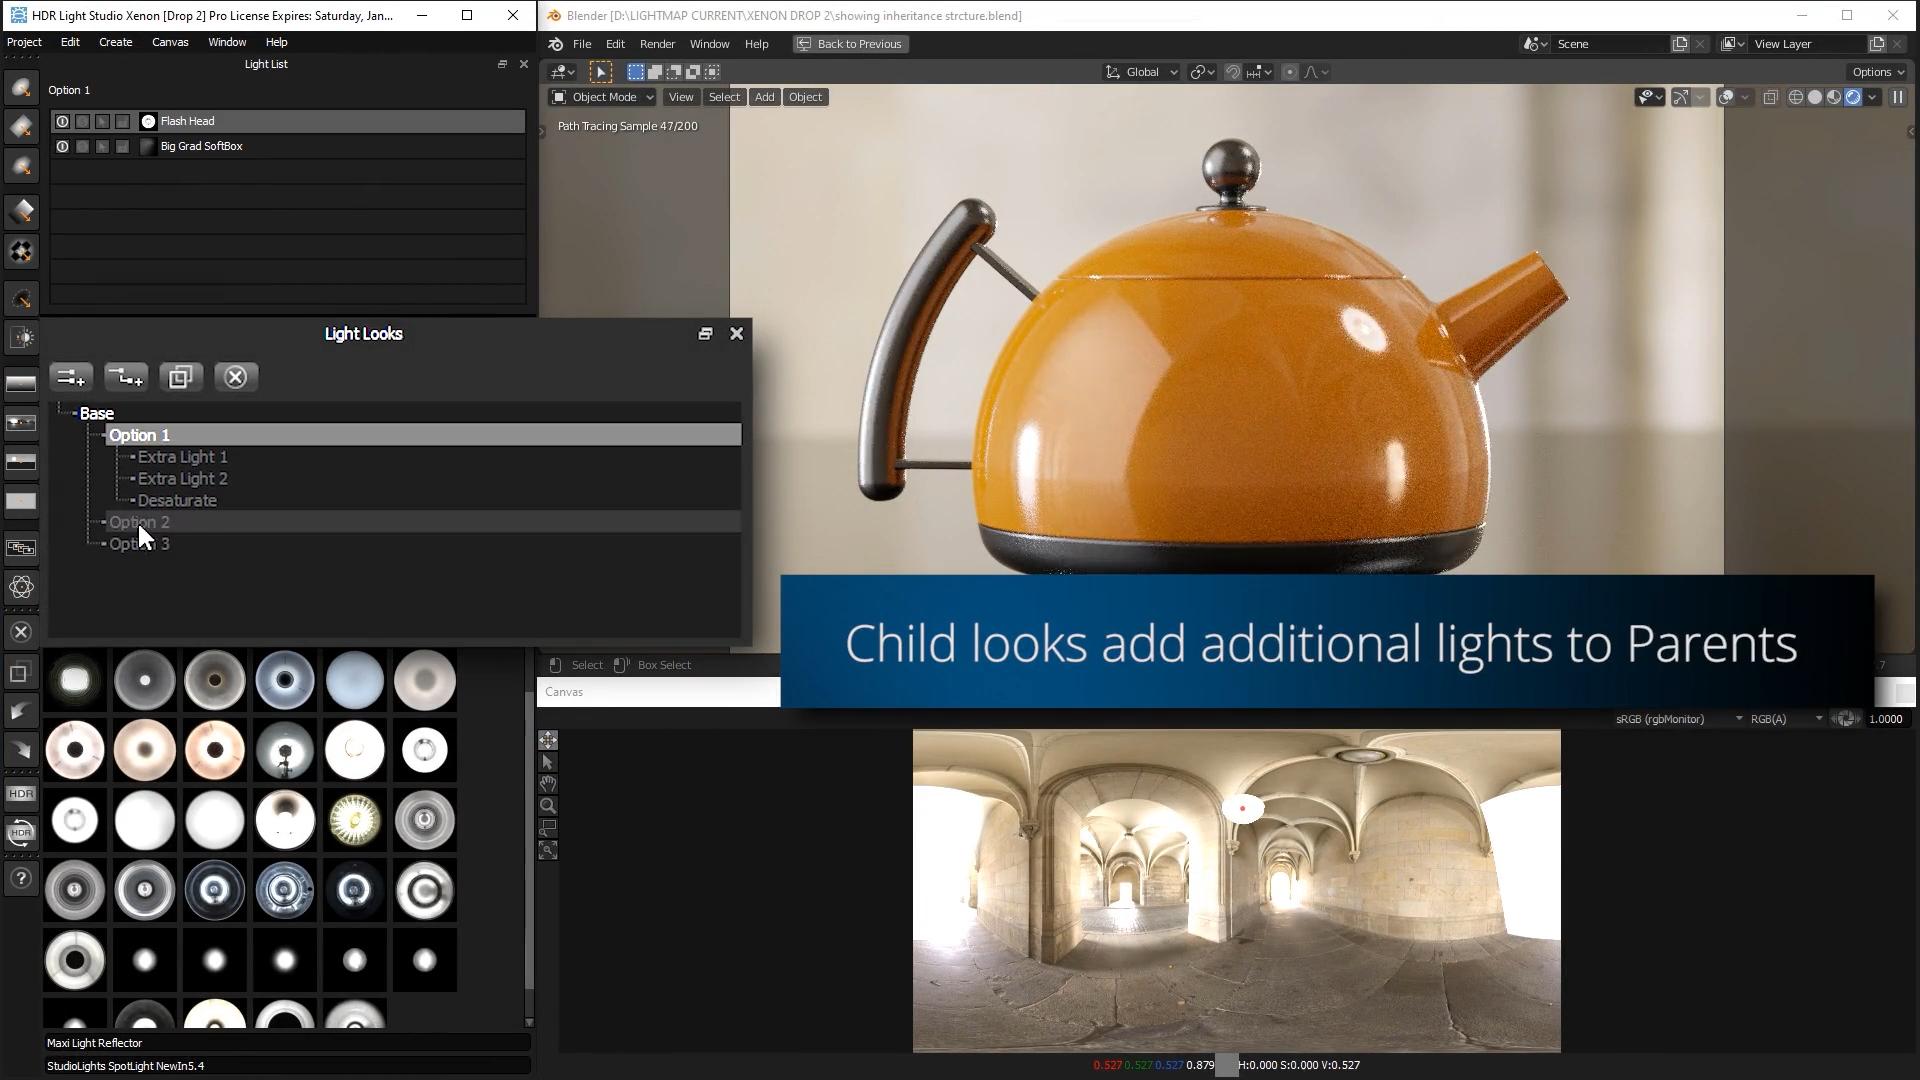 Lightmap发布HDR Light Studio Xenon Drop 2